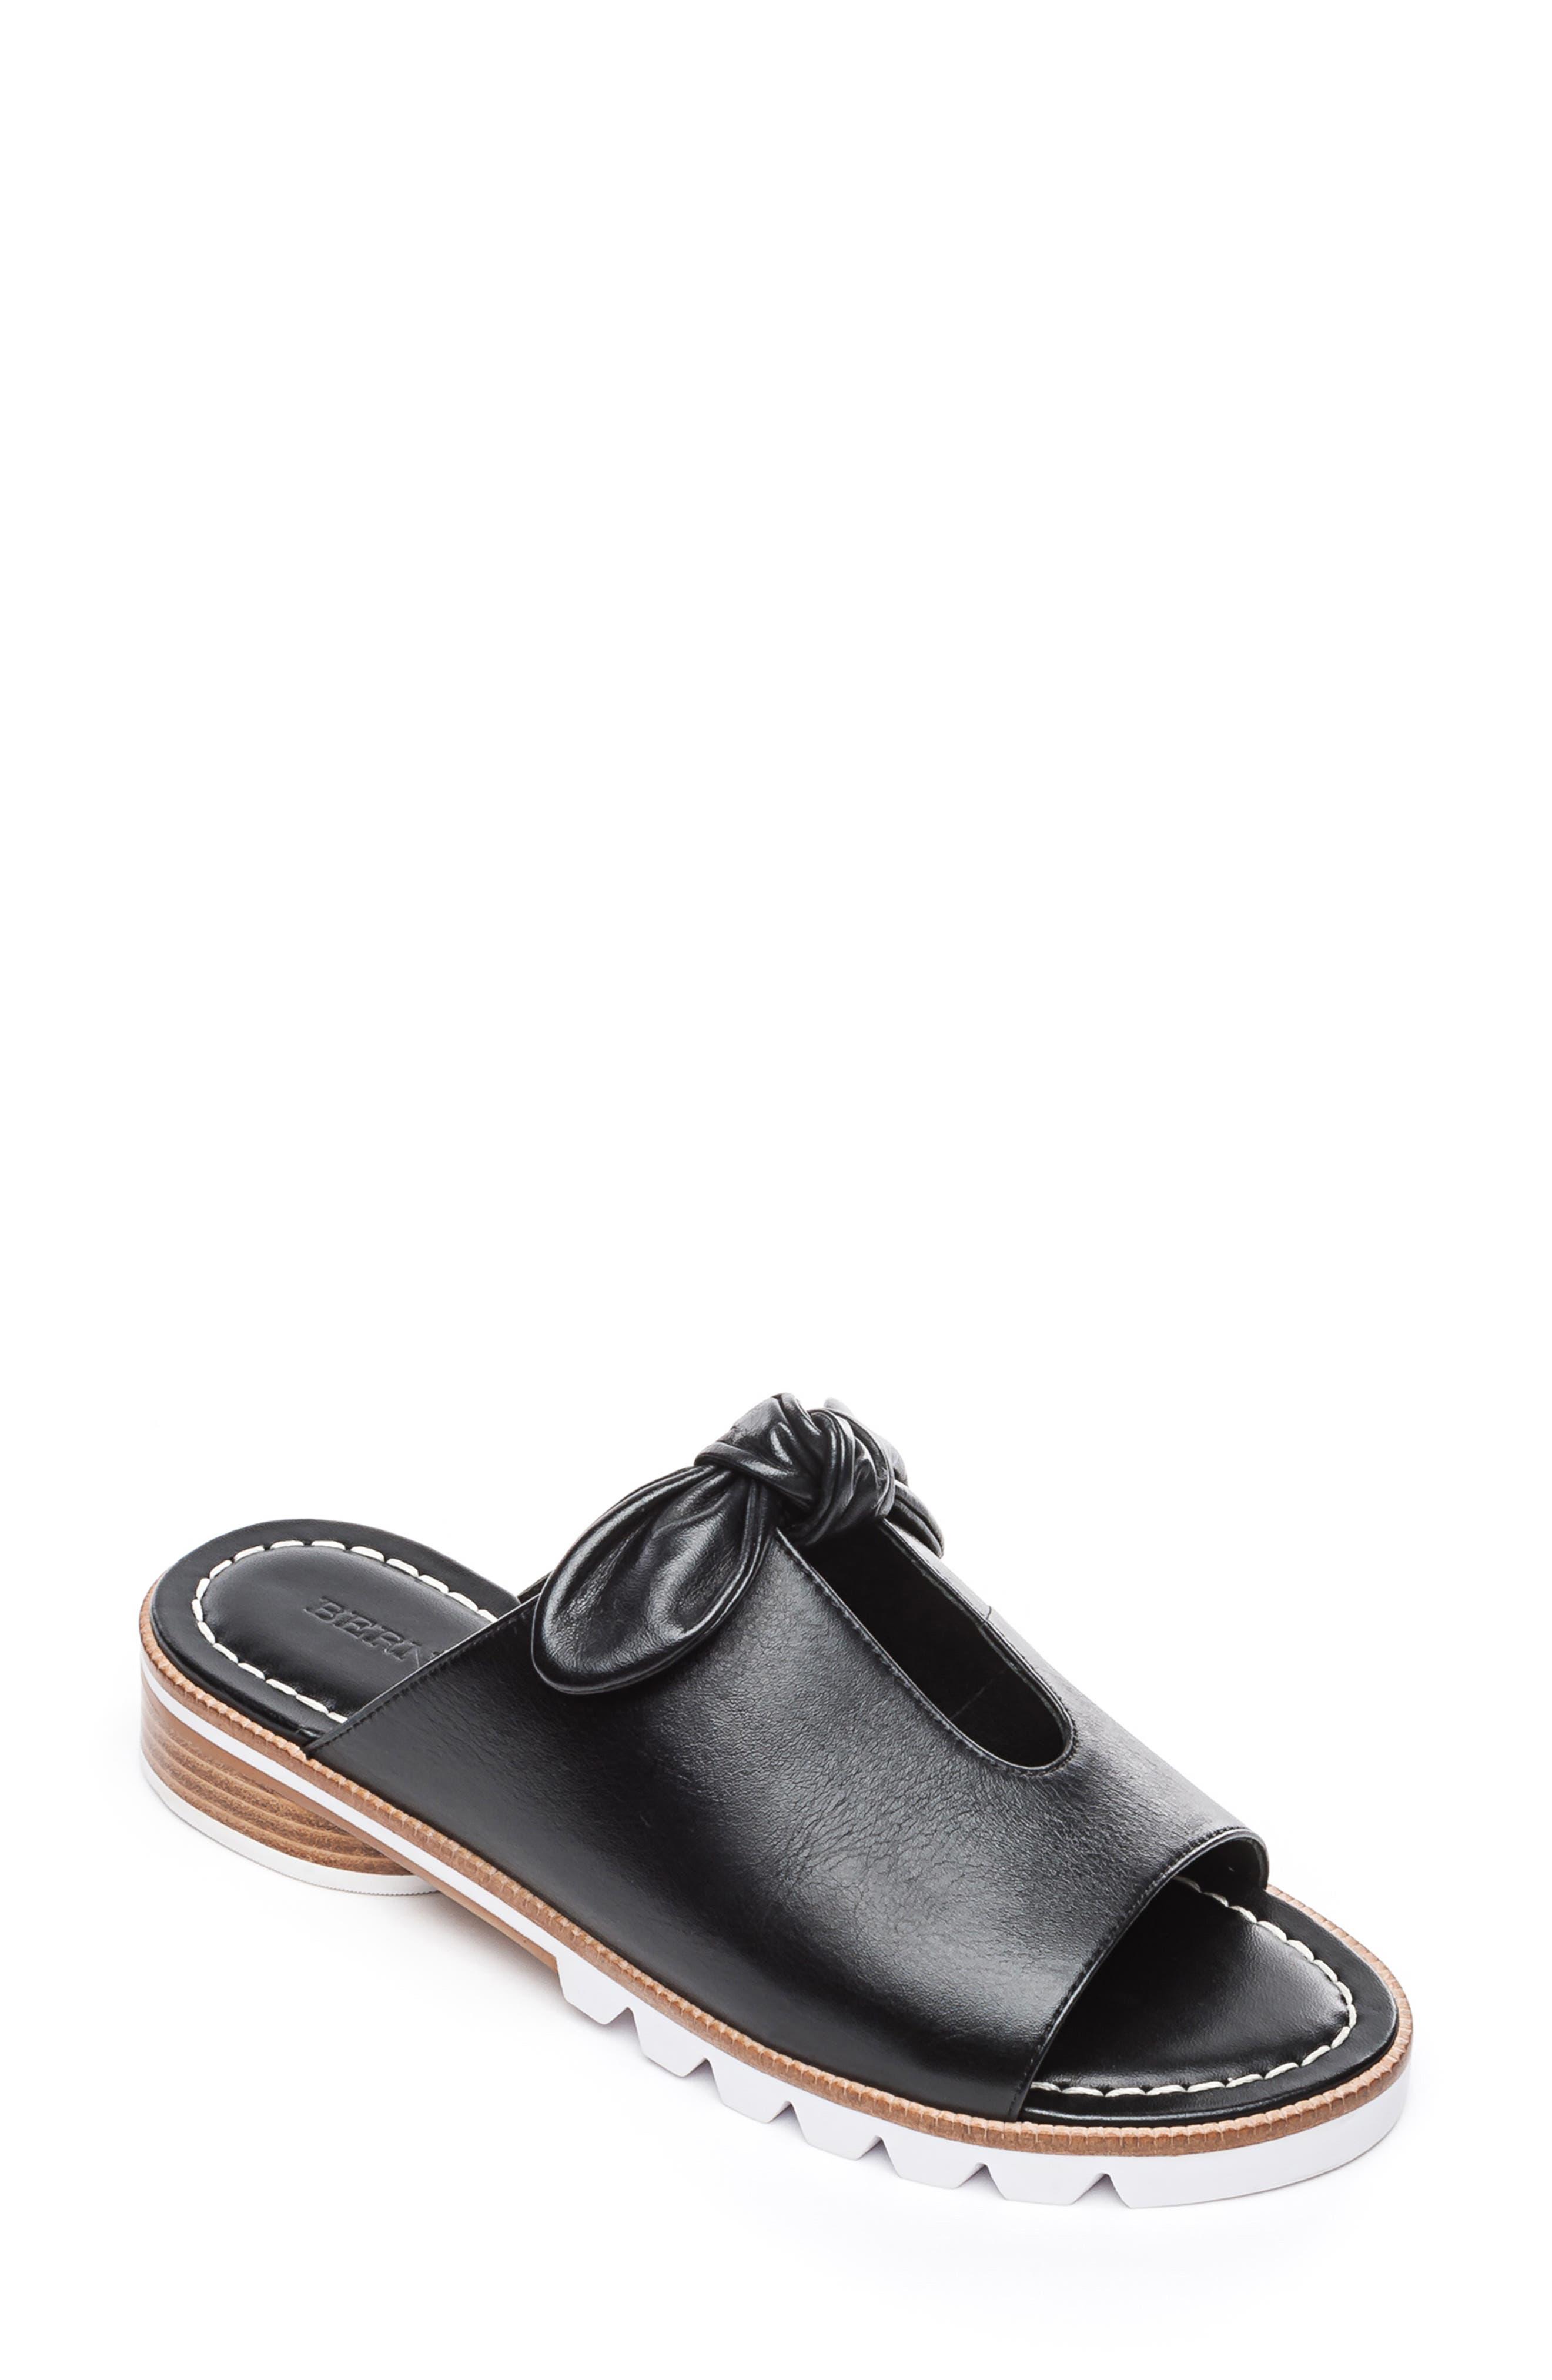 BERNARDO Alice Bow Slide Sandal, Main, color, BLACK LEATHER